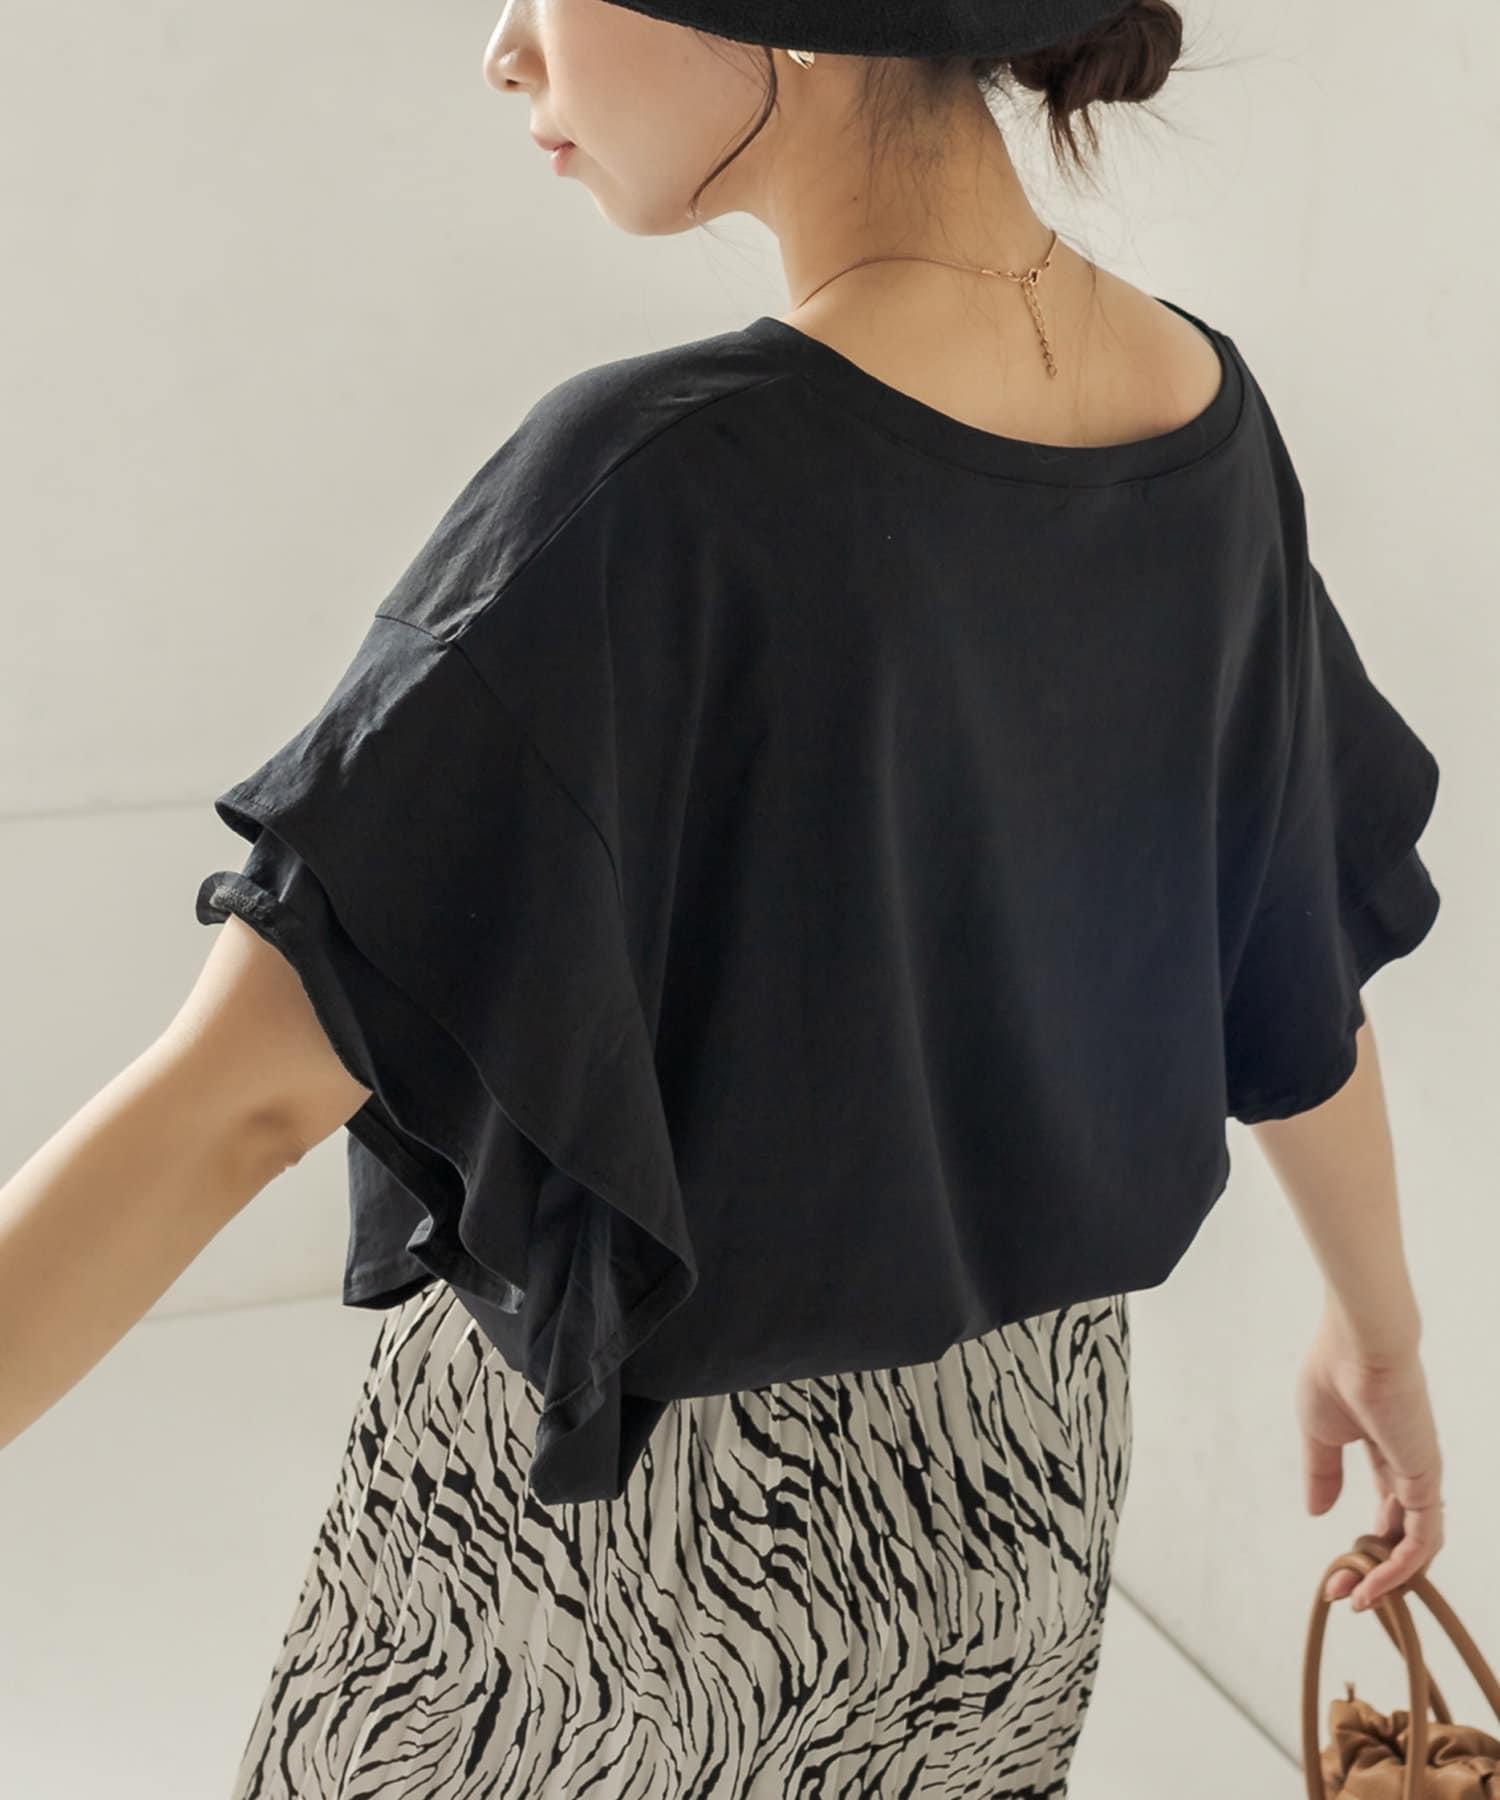 CAPRICIEUX LE'MAGE(カプリシュレマージュ) 〈WEB限定〉フリルスリーブTシャツ